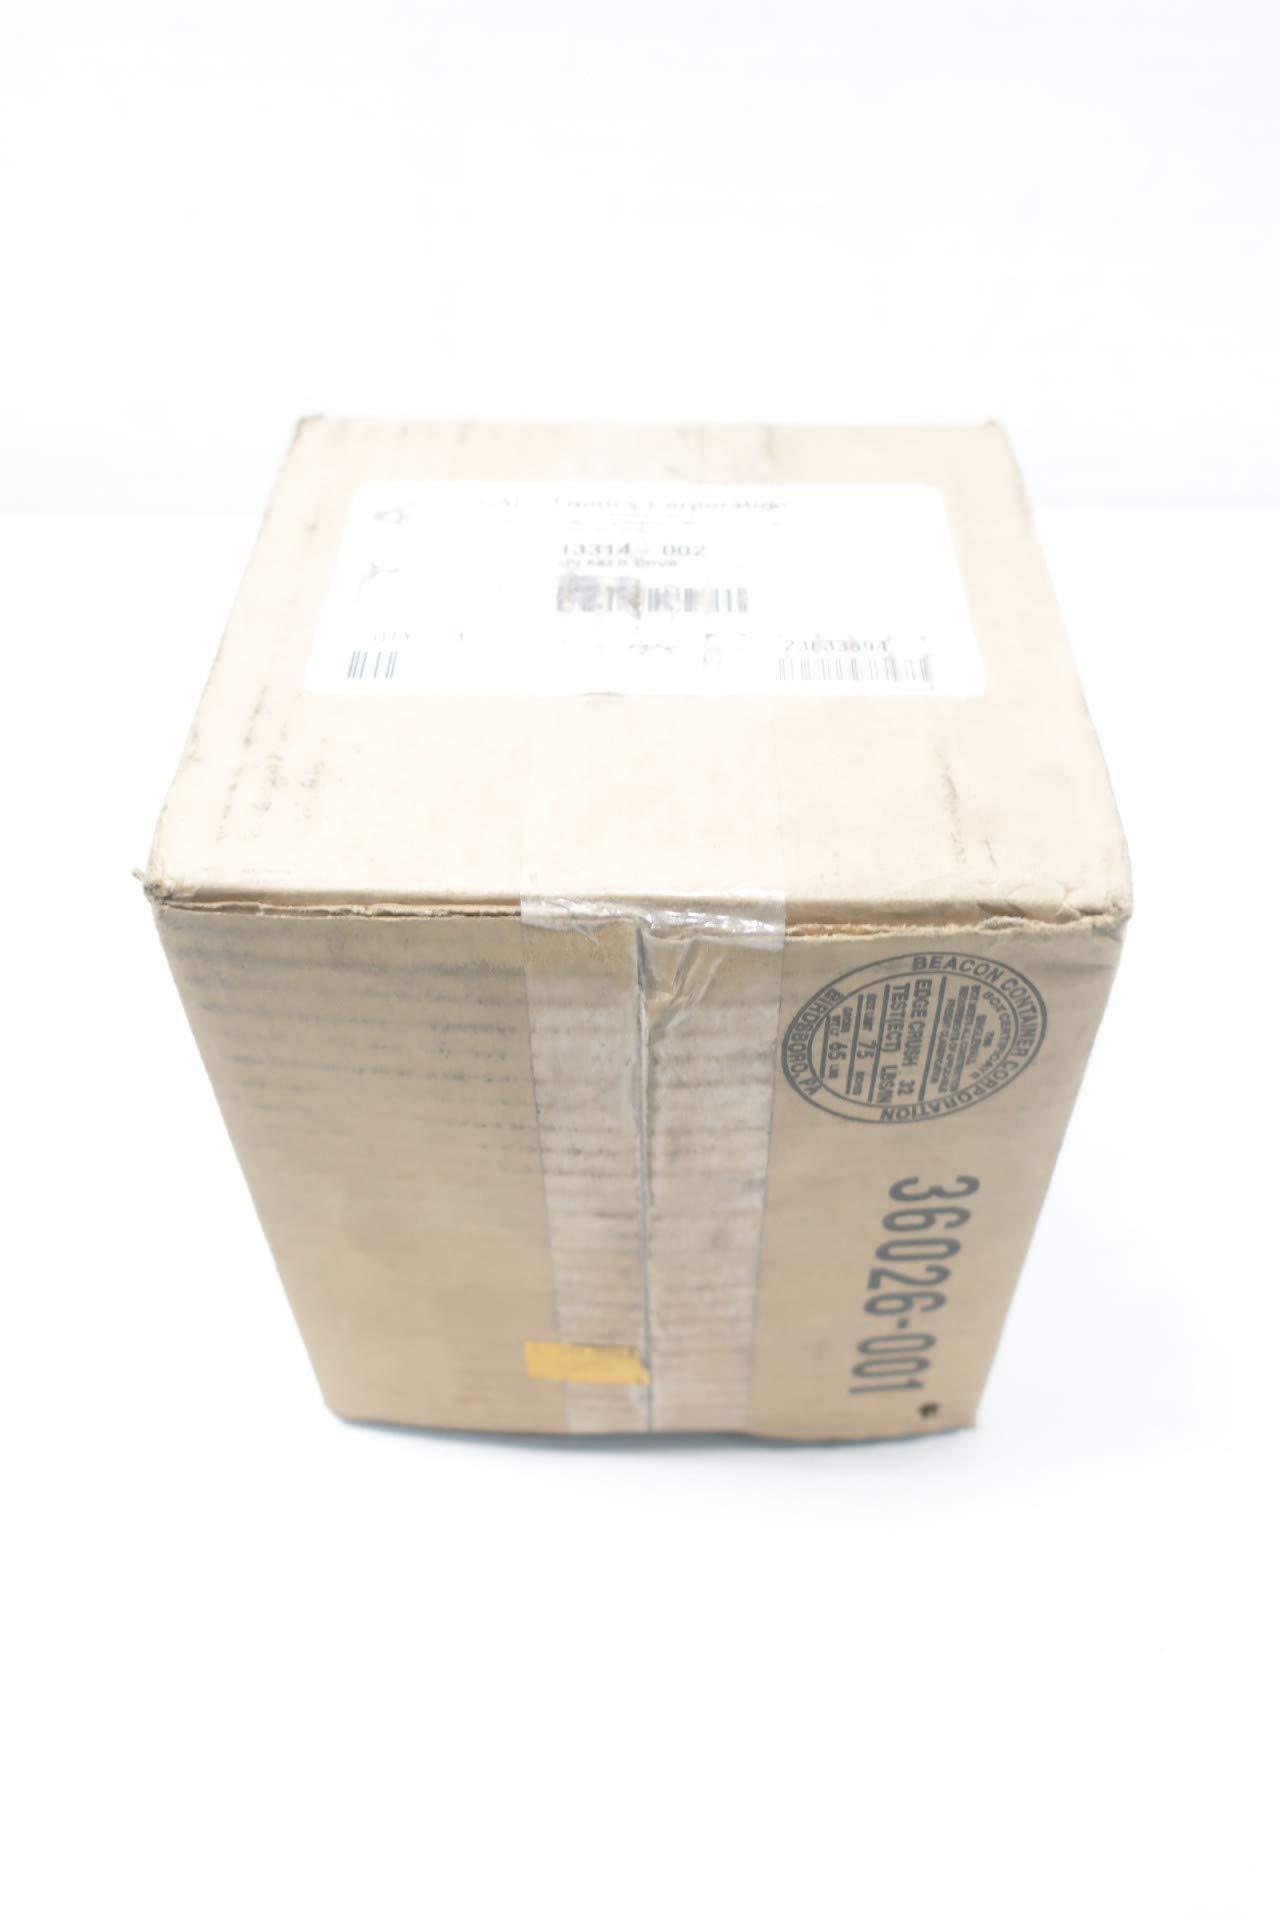 GAI-TRONICS 13314-002 Speaker Driver Unit 30W 16OHM D663352 by Gai-Tronics (Image #4)